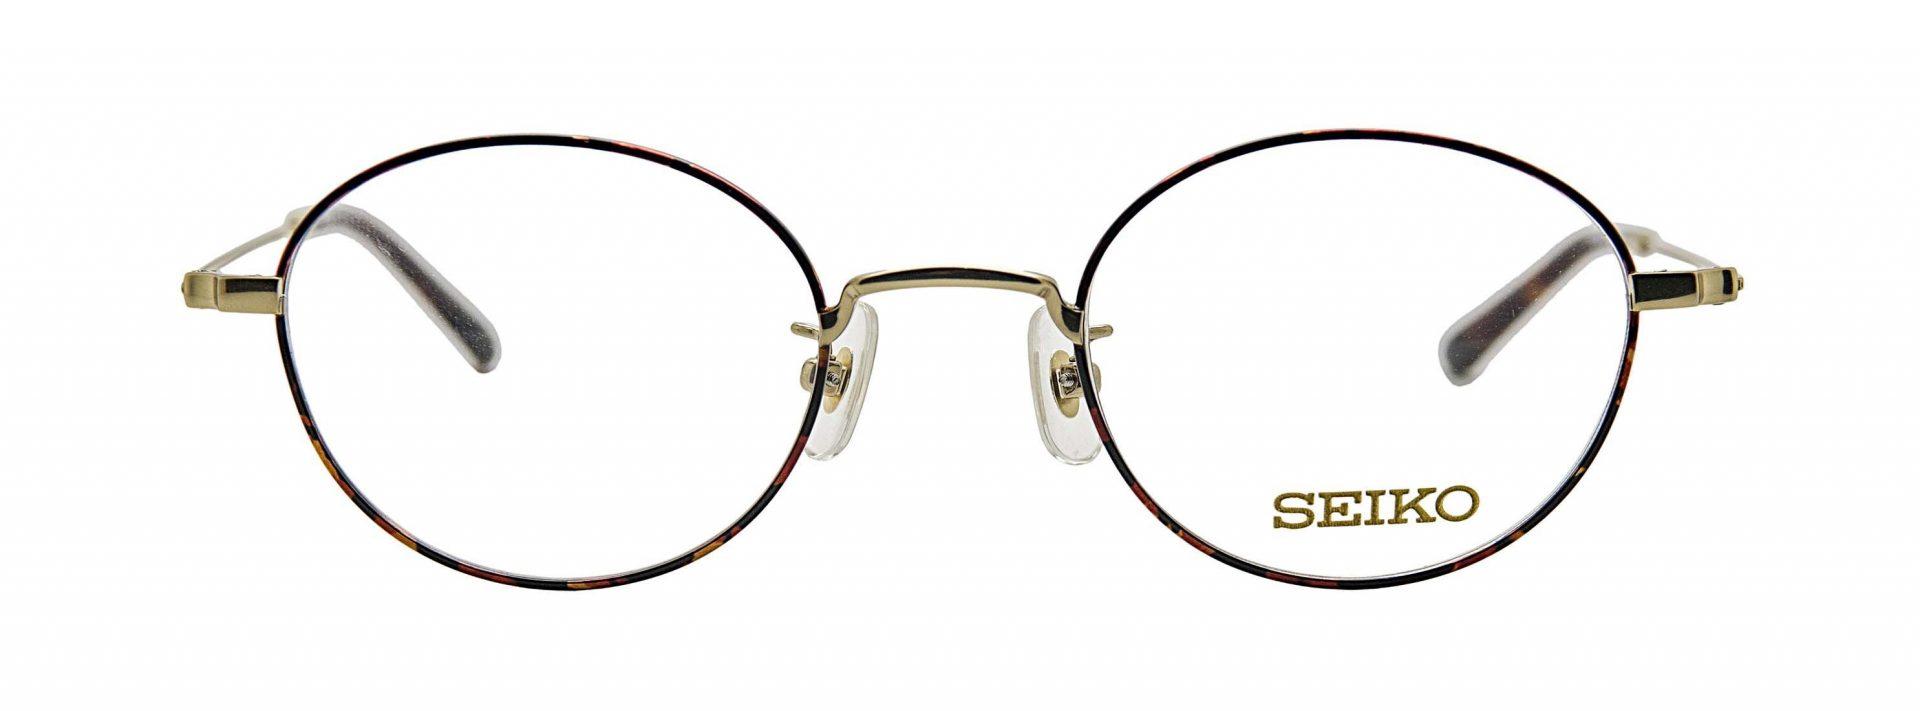 Seiko spectacles T984 01 2970x1100